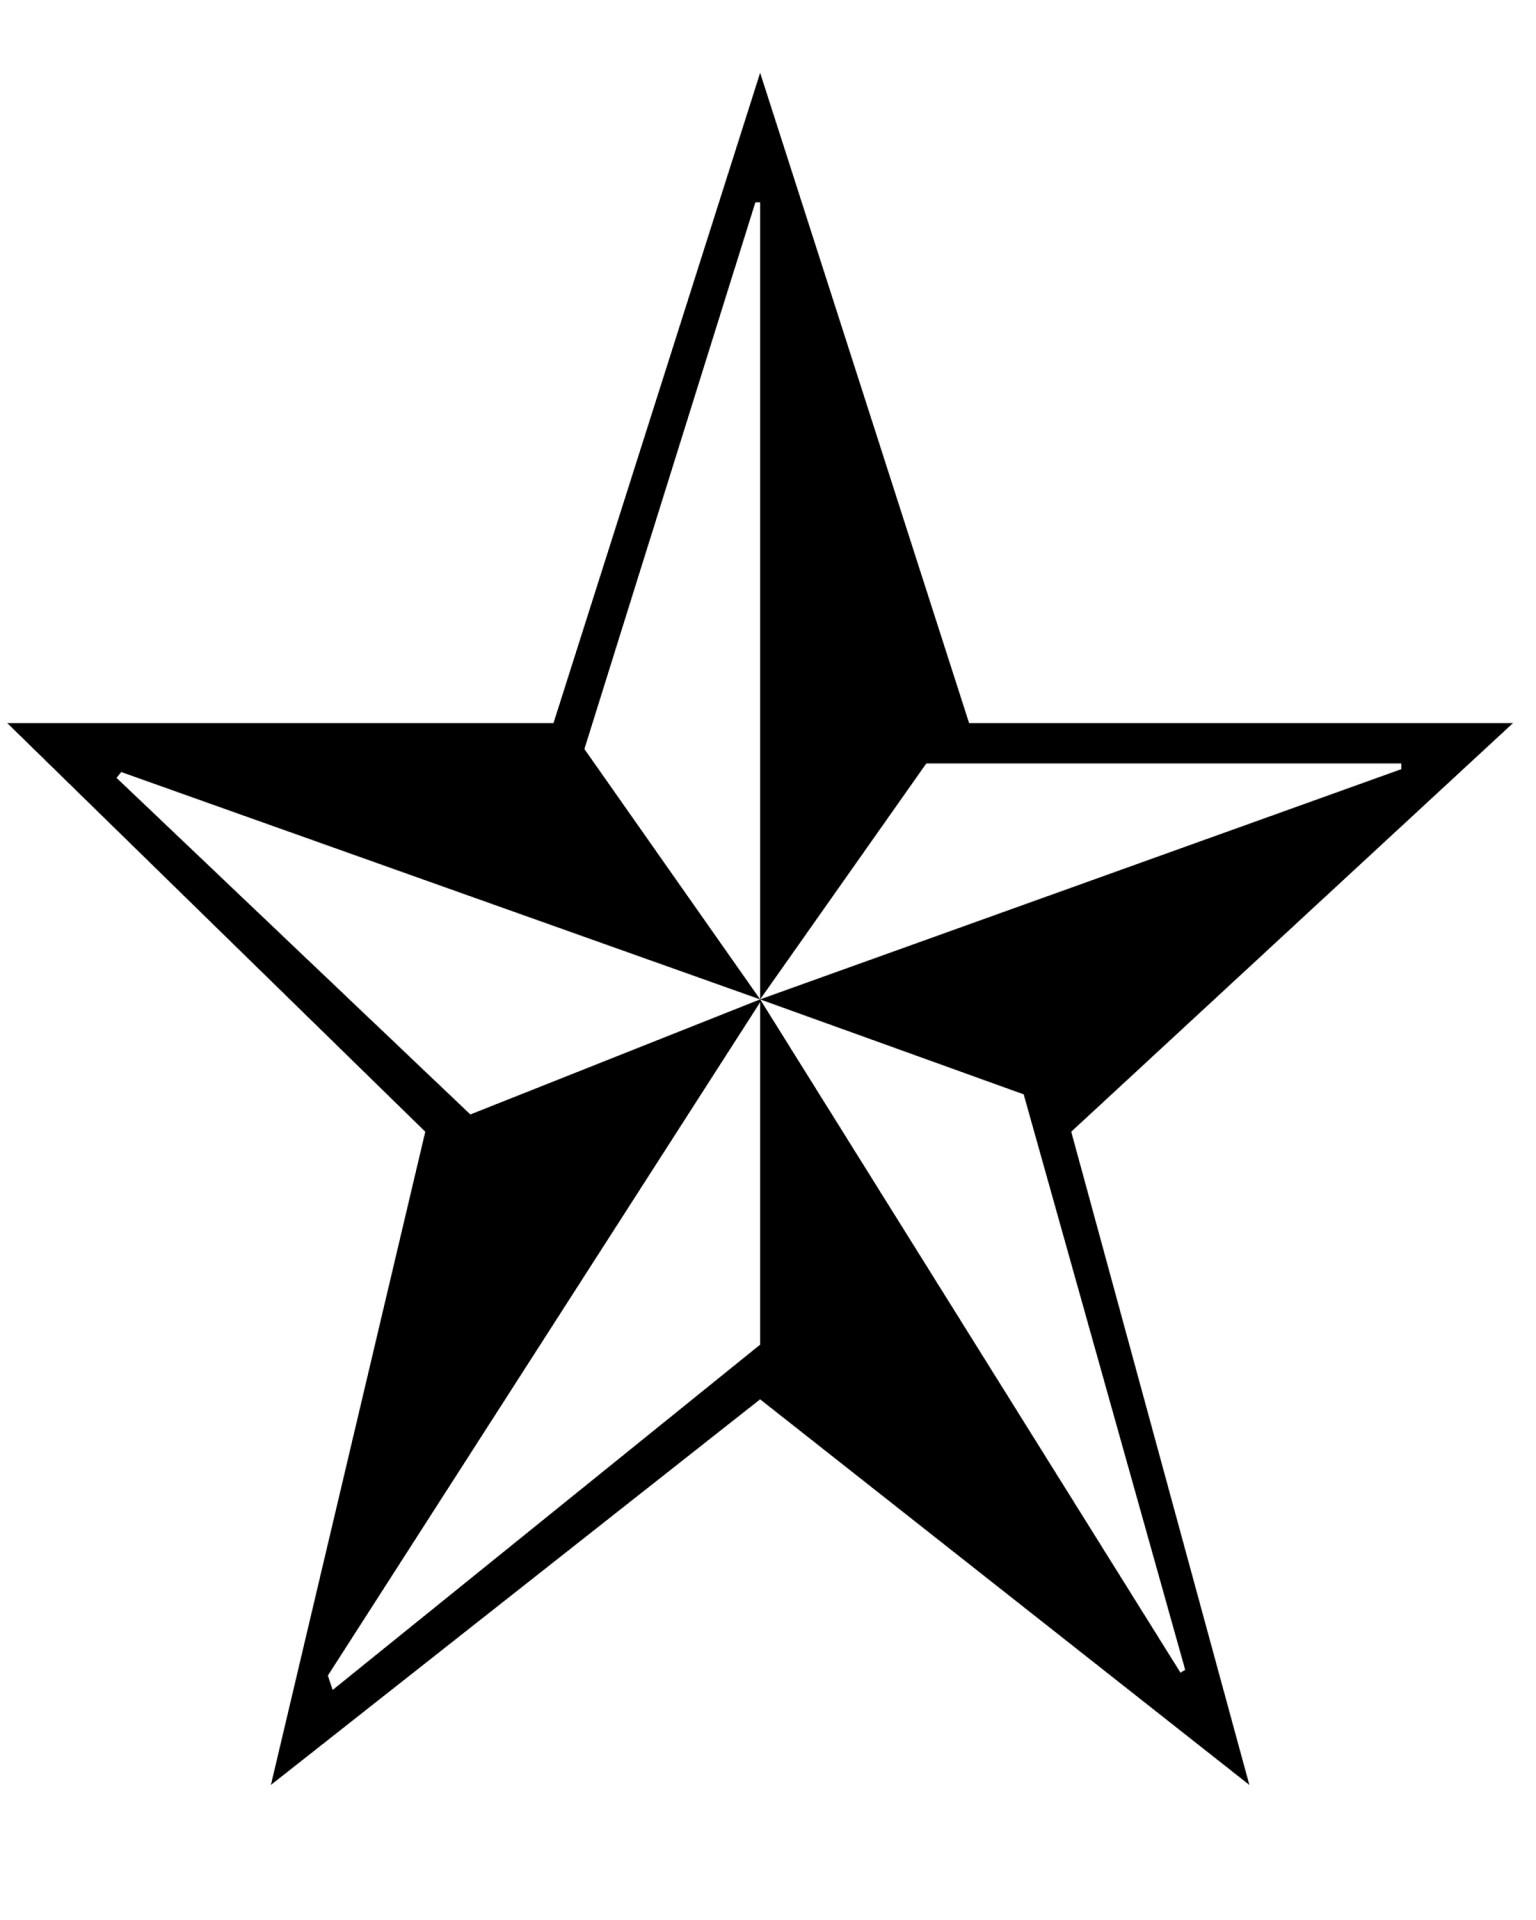 Star Clipart-star clipart-15